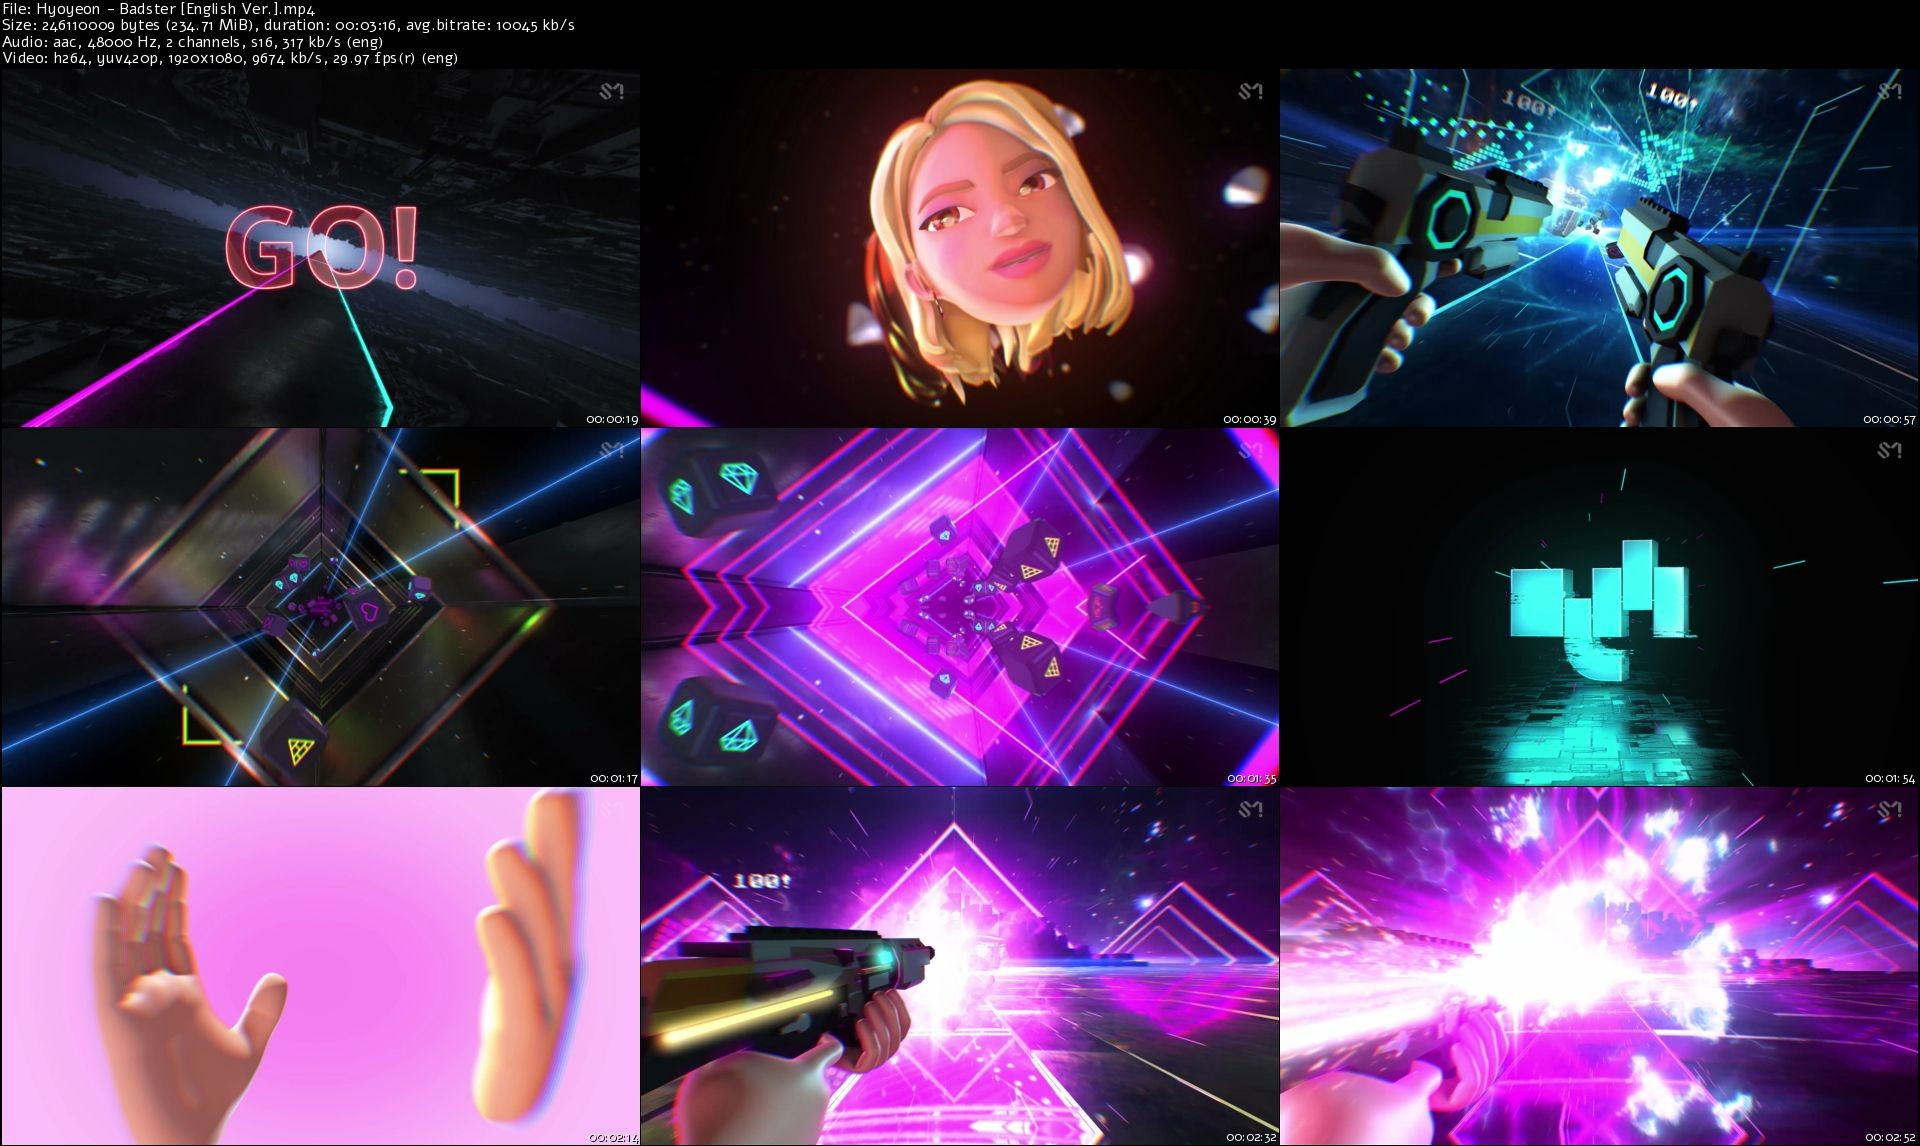 Hyoyeon (효연) – Badster [MP4 1080p / WEB / Bugs English Version – 2019] [2019.07.20]